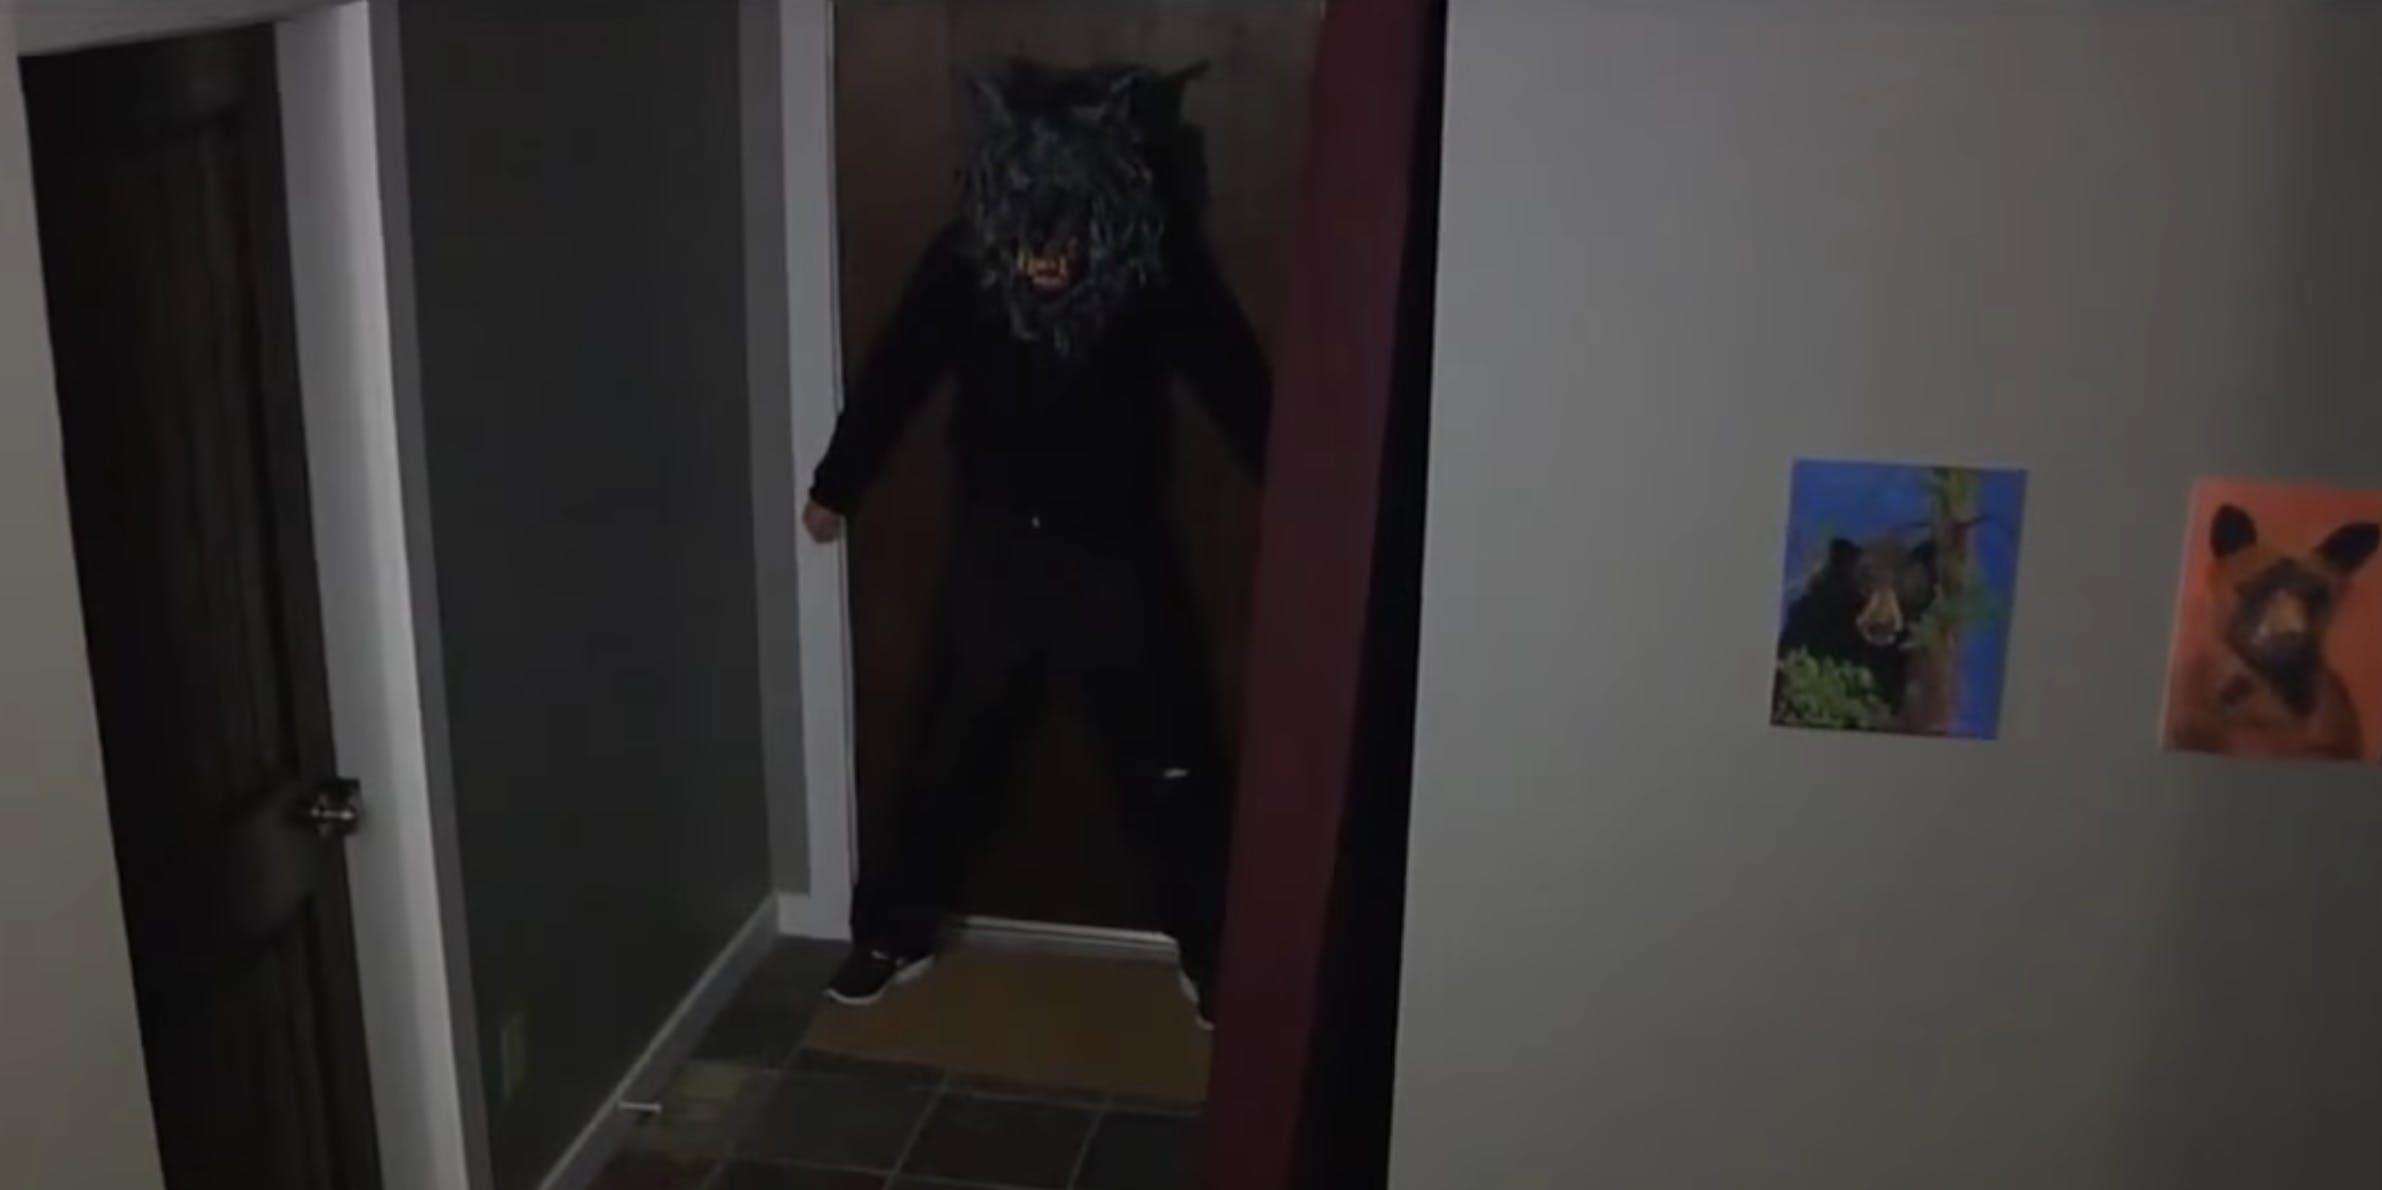 best scary movies on netflix: Creep